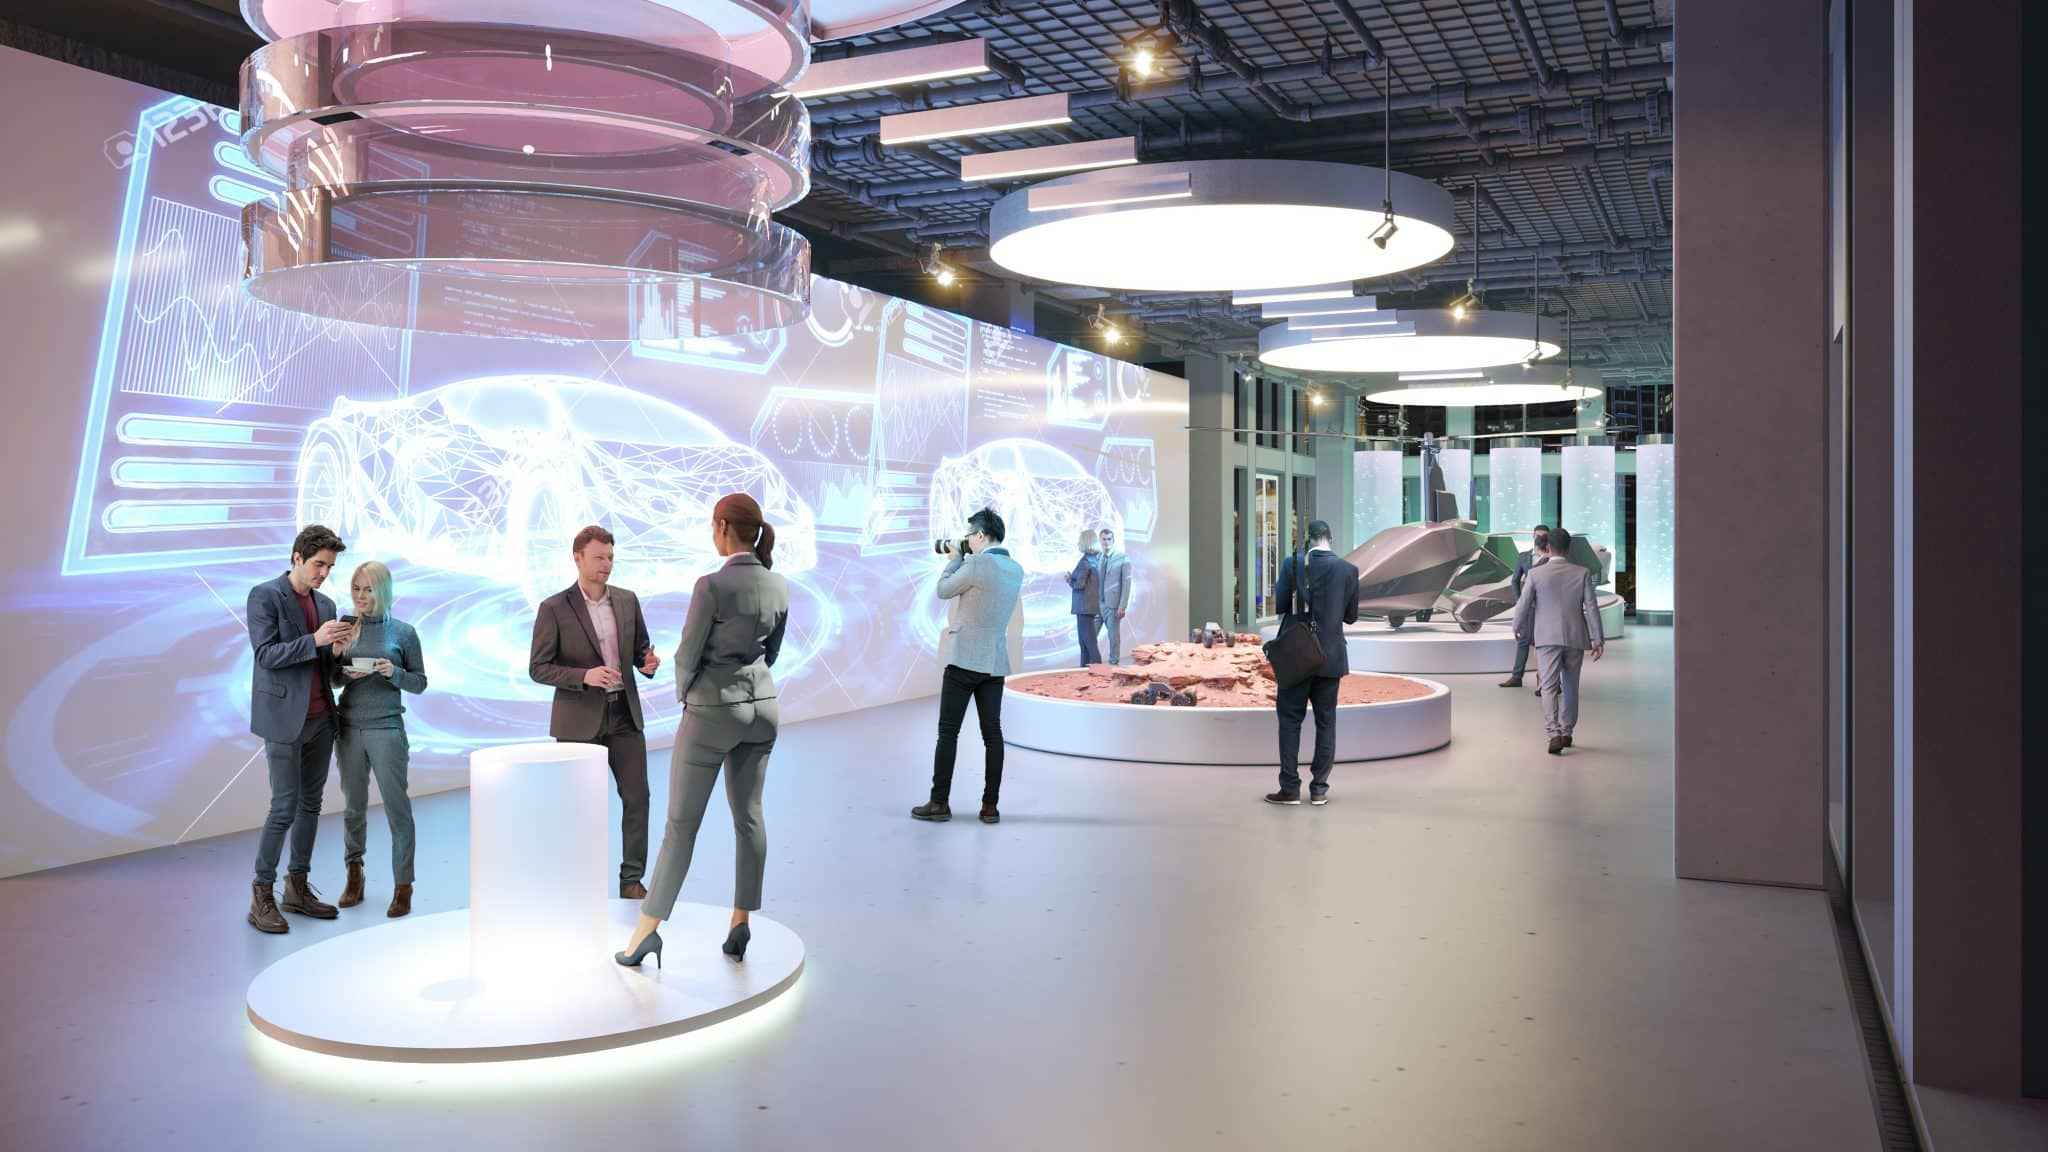 Slovenský pavilón Expo Dubaj 2020 D